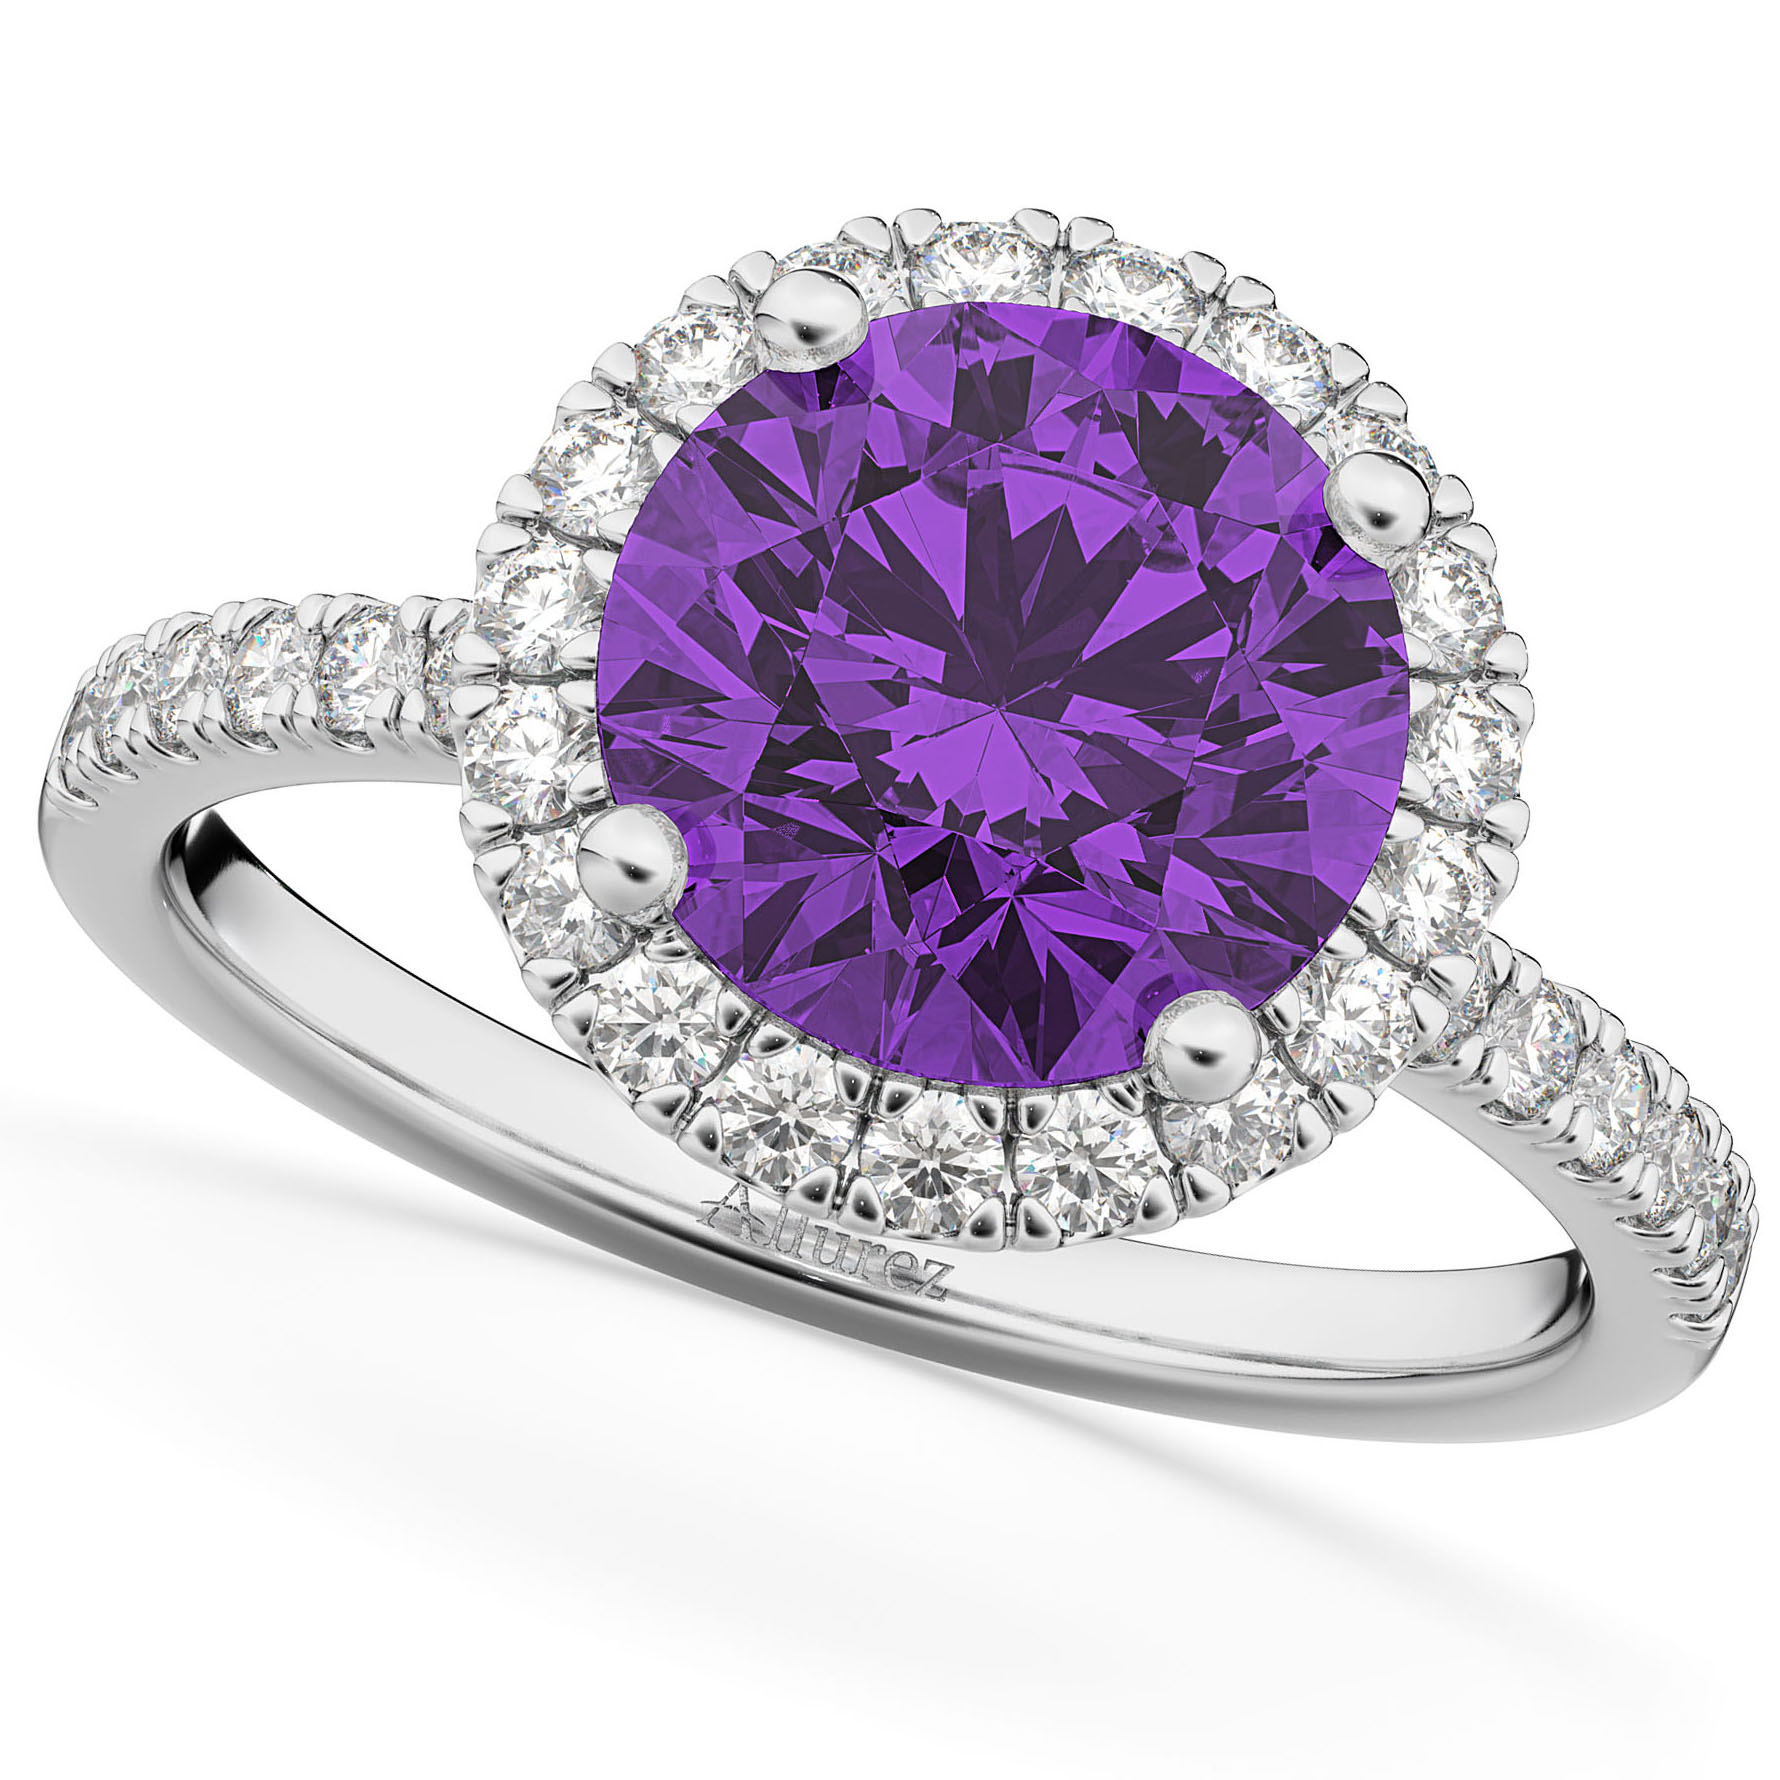 Halo Amethyst & Diamond Engagement Ring 14K White Gold 2.30ct